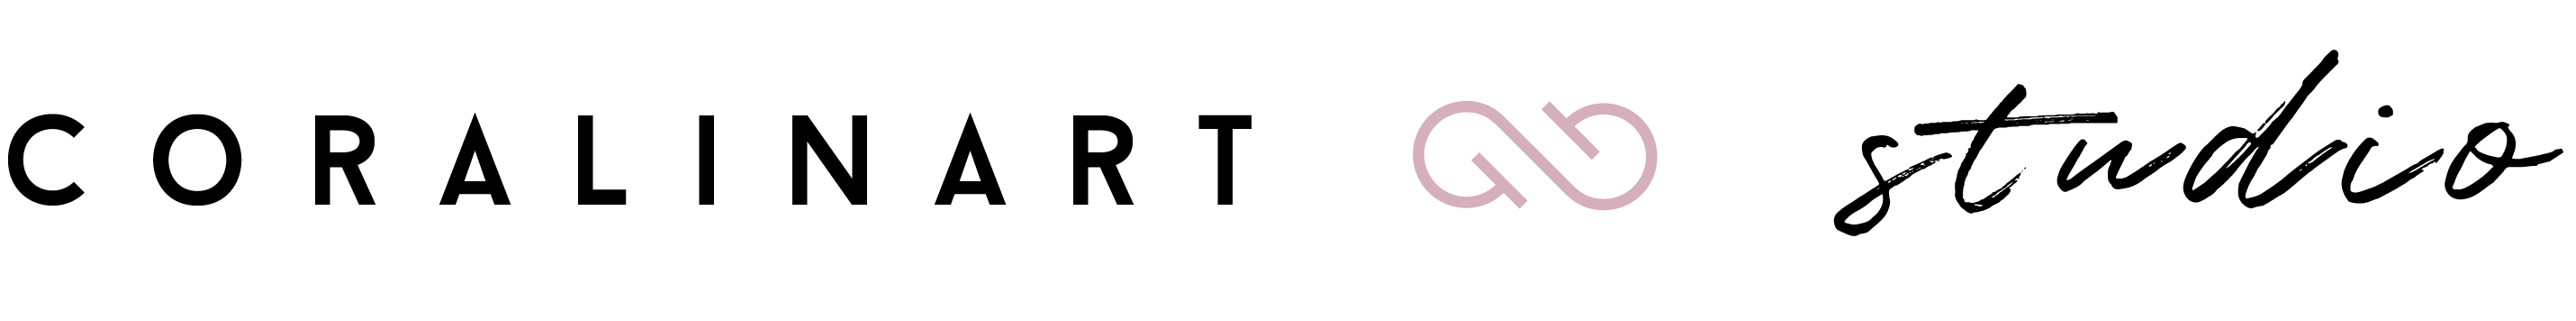 Coralinart Studio